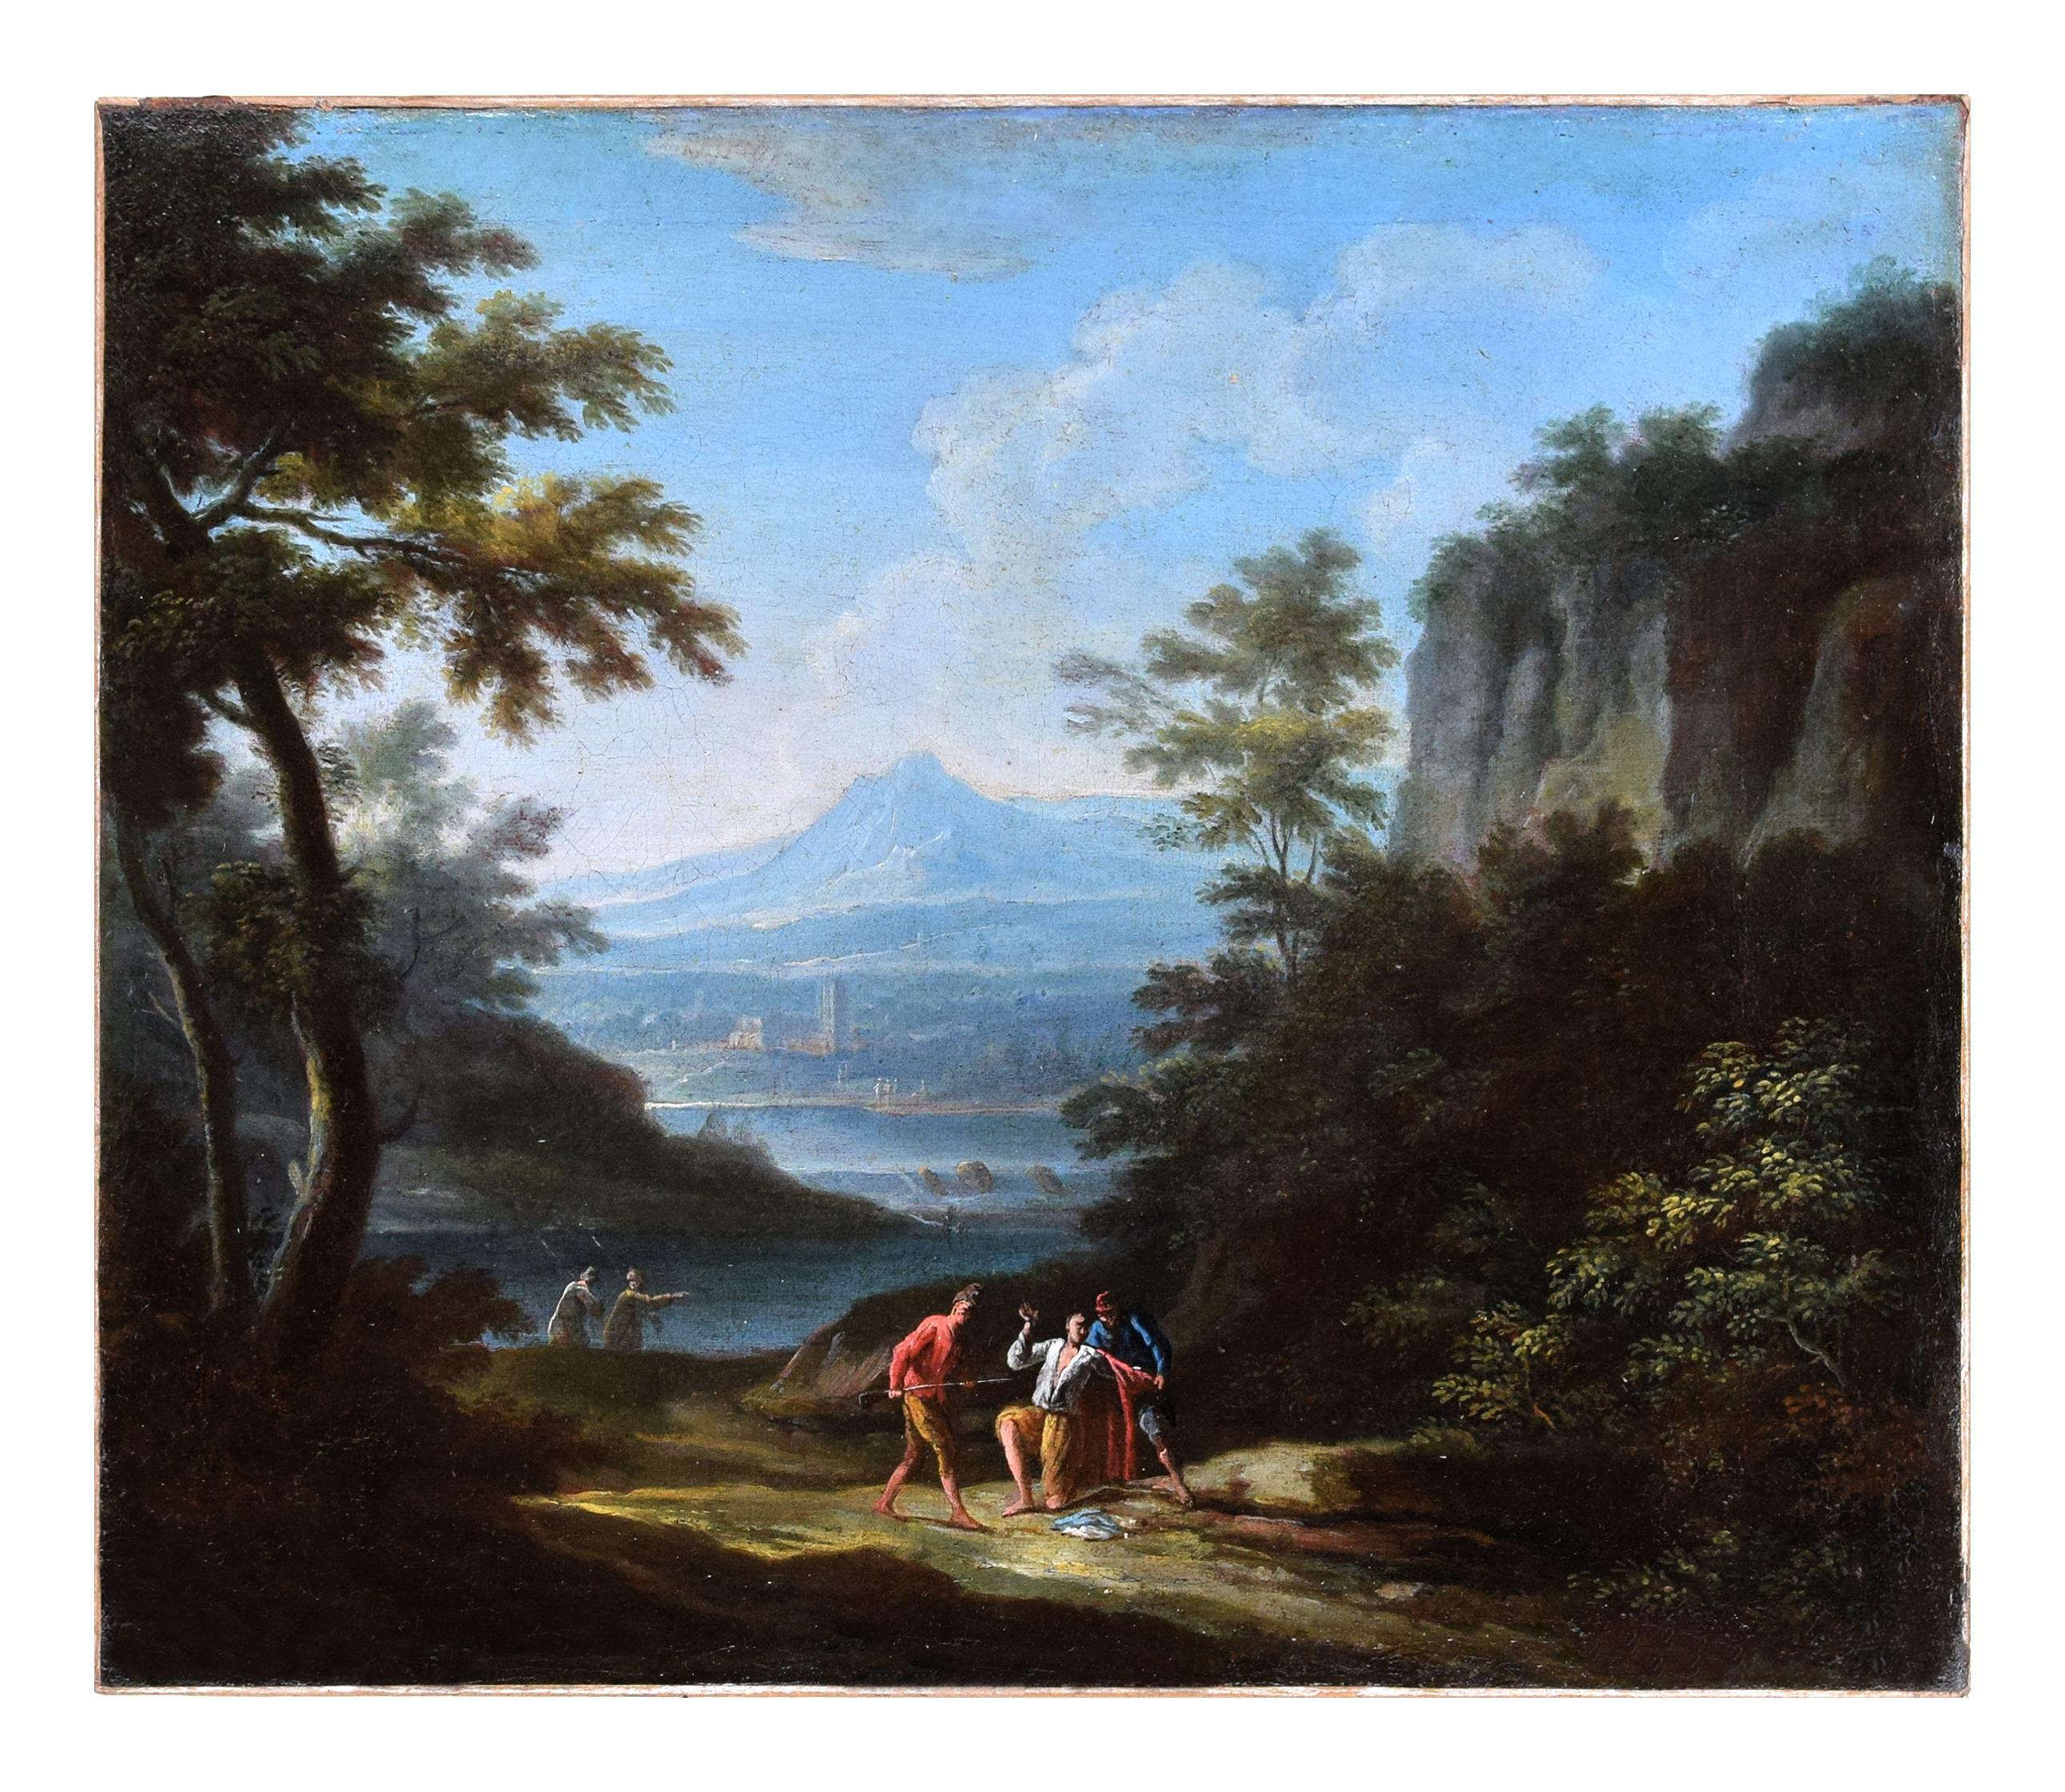 Two Arcadic Landscapes - J.F. Van Bloemen (follower of) - Oil on Canvas